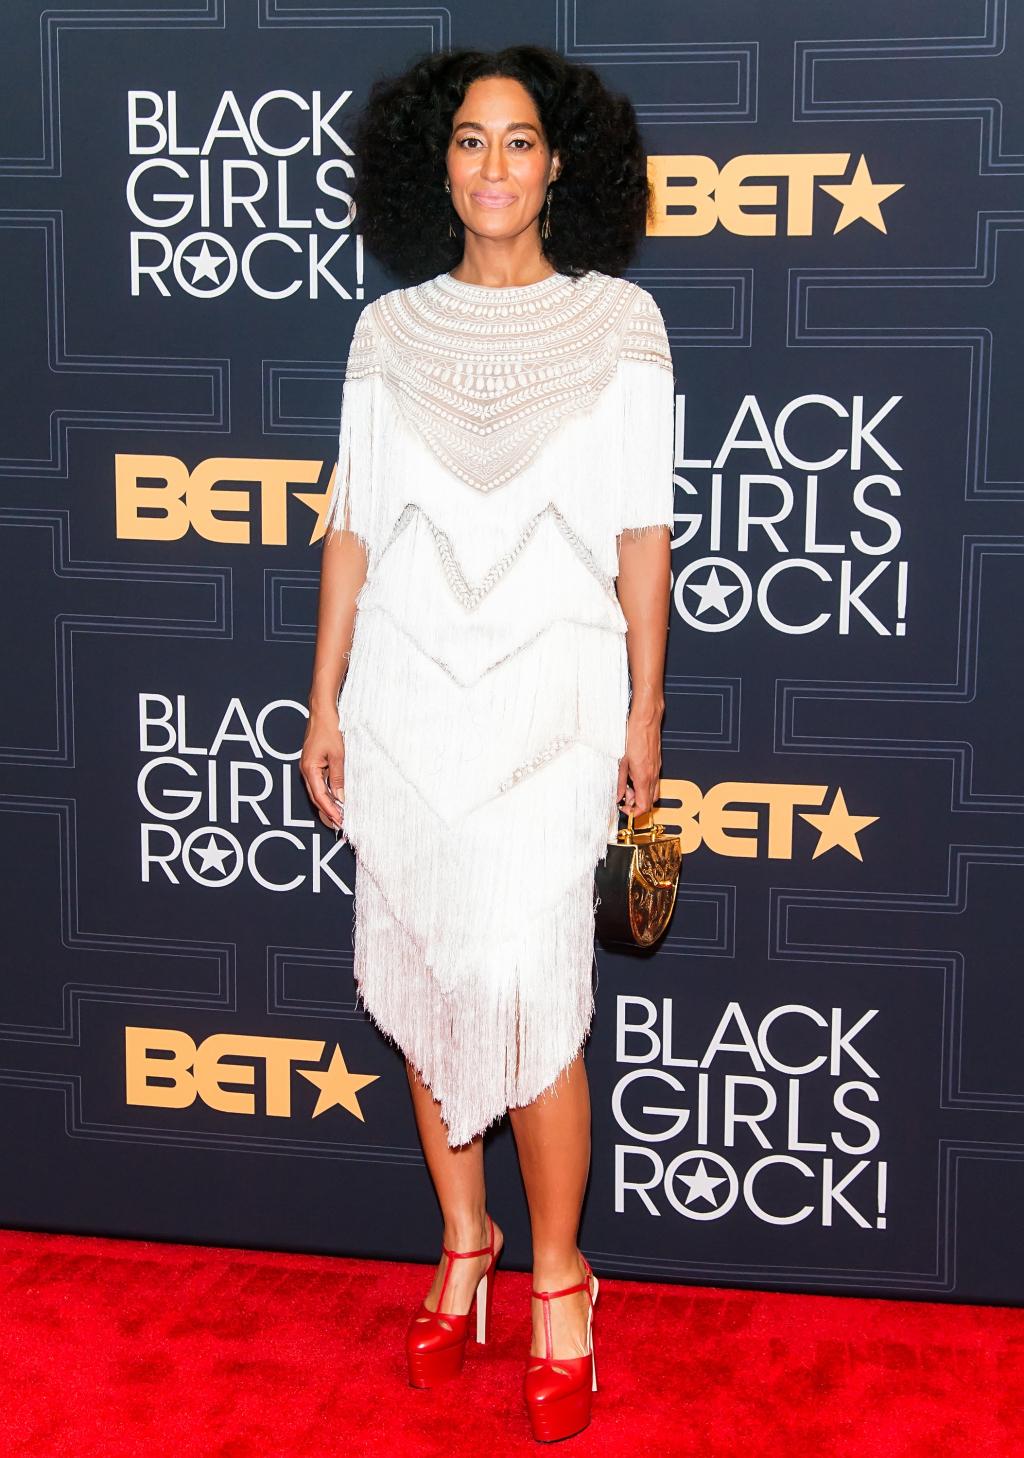 NEWARK, NEW JERSEY - APRIL 01: Actress BET Black Girls Rock! 2016 host Tracee Ellis Ross attends BET Black Girls Rock! 2016 at New Jersey Performing Arts Center on April 1, 2016 in Newark, New Jersey. (Photo by Gilbert Carrasquillo/FilmMagic)